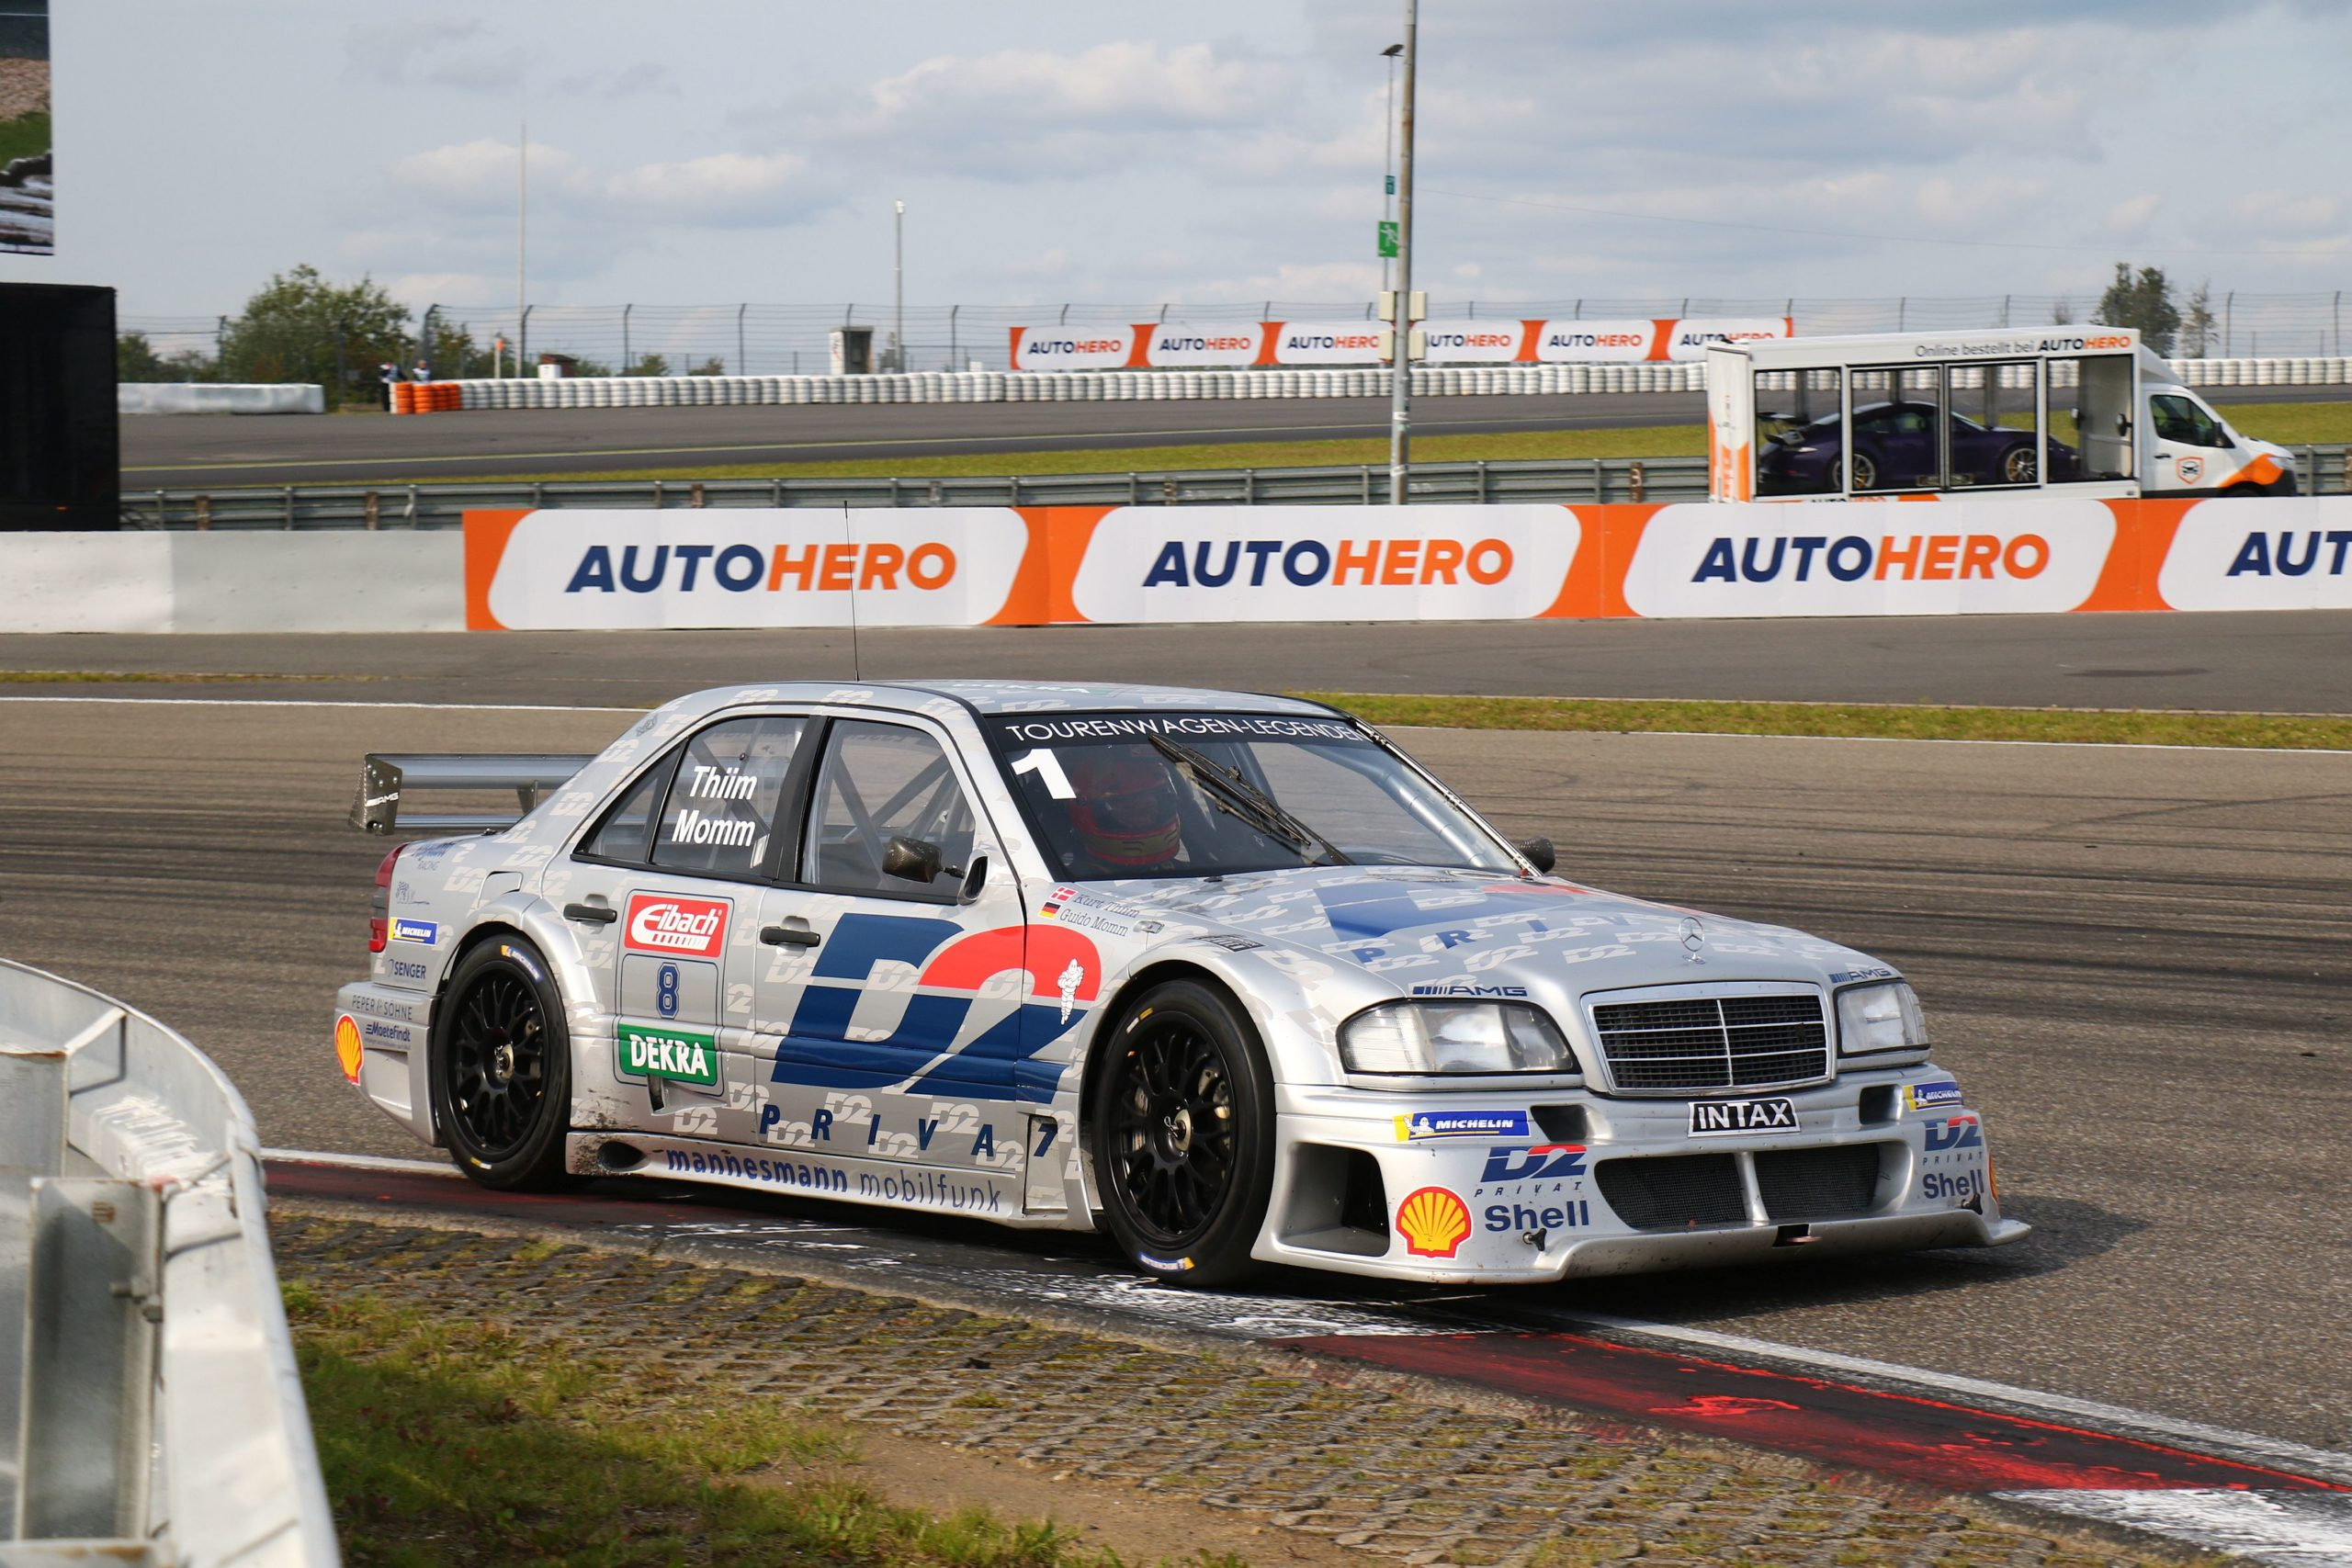 2021-DTM-Classic-Nuerburgring-tst-sport-und-technik-Mercedes-Benz-C-Klasse-Guido-Momm-2117098